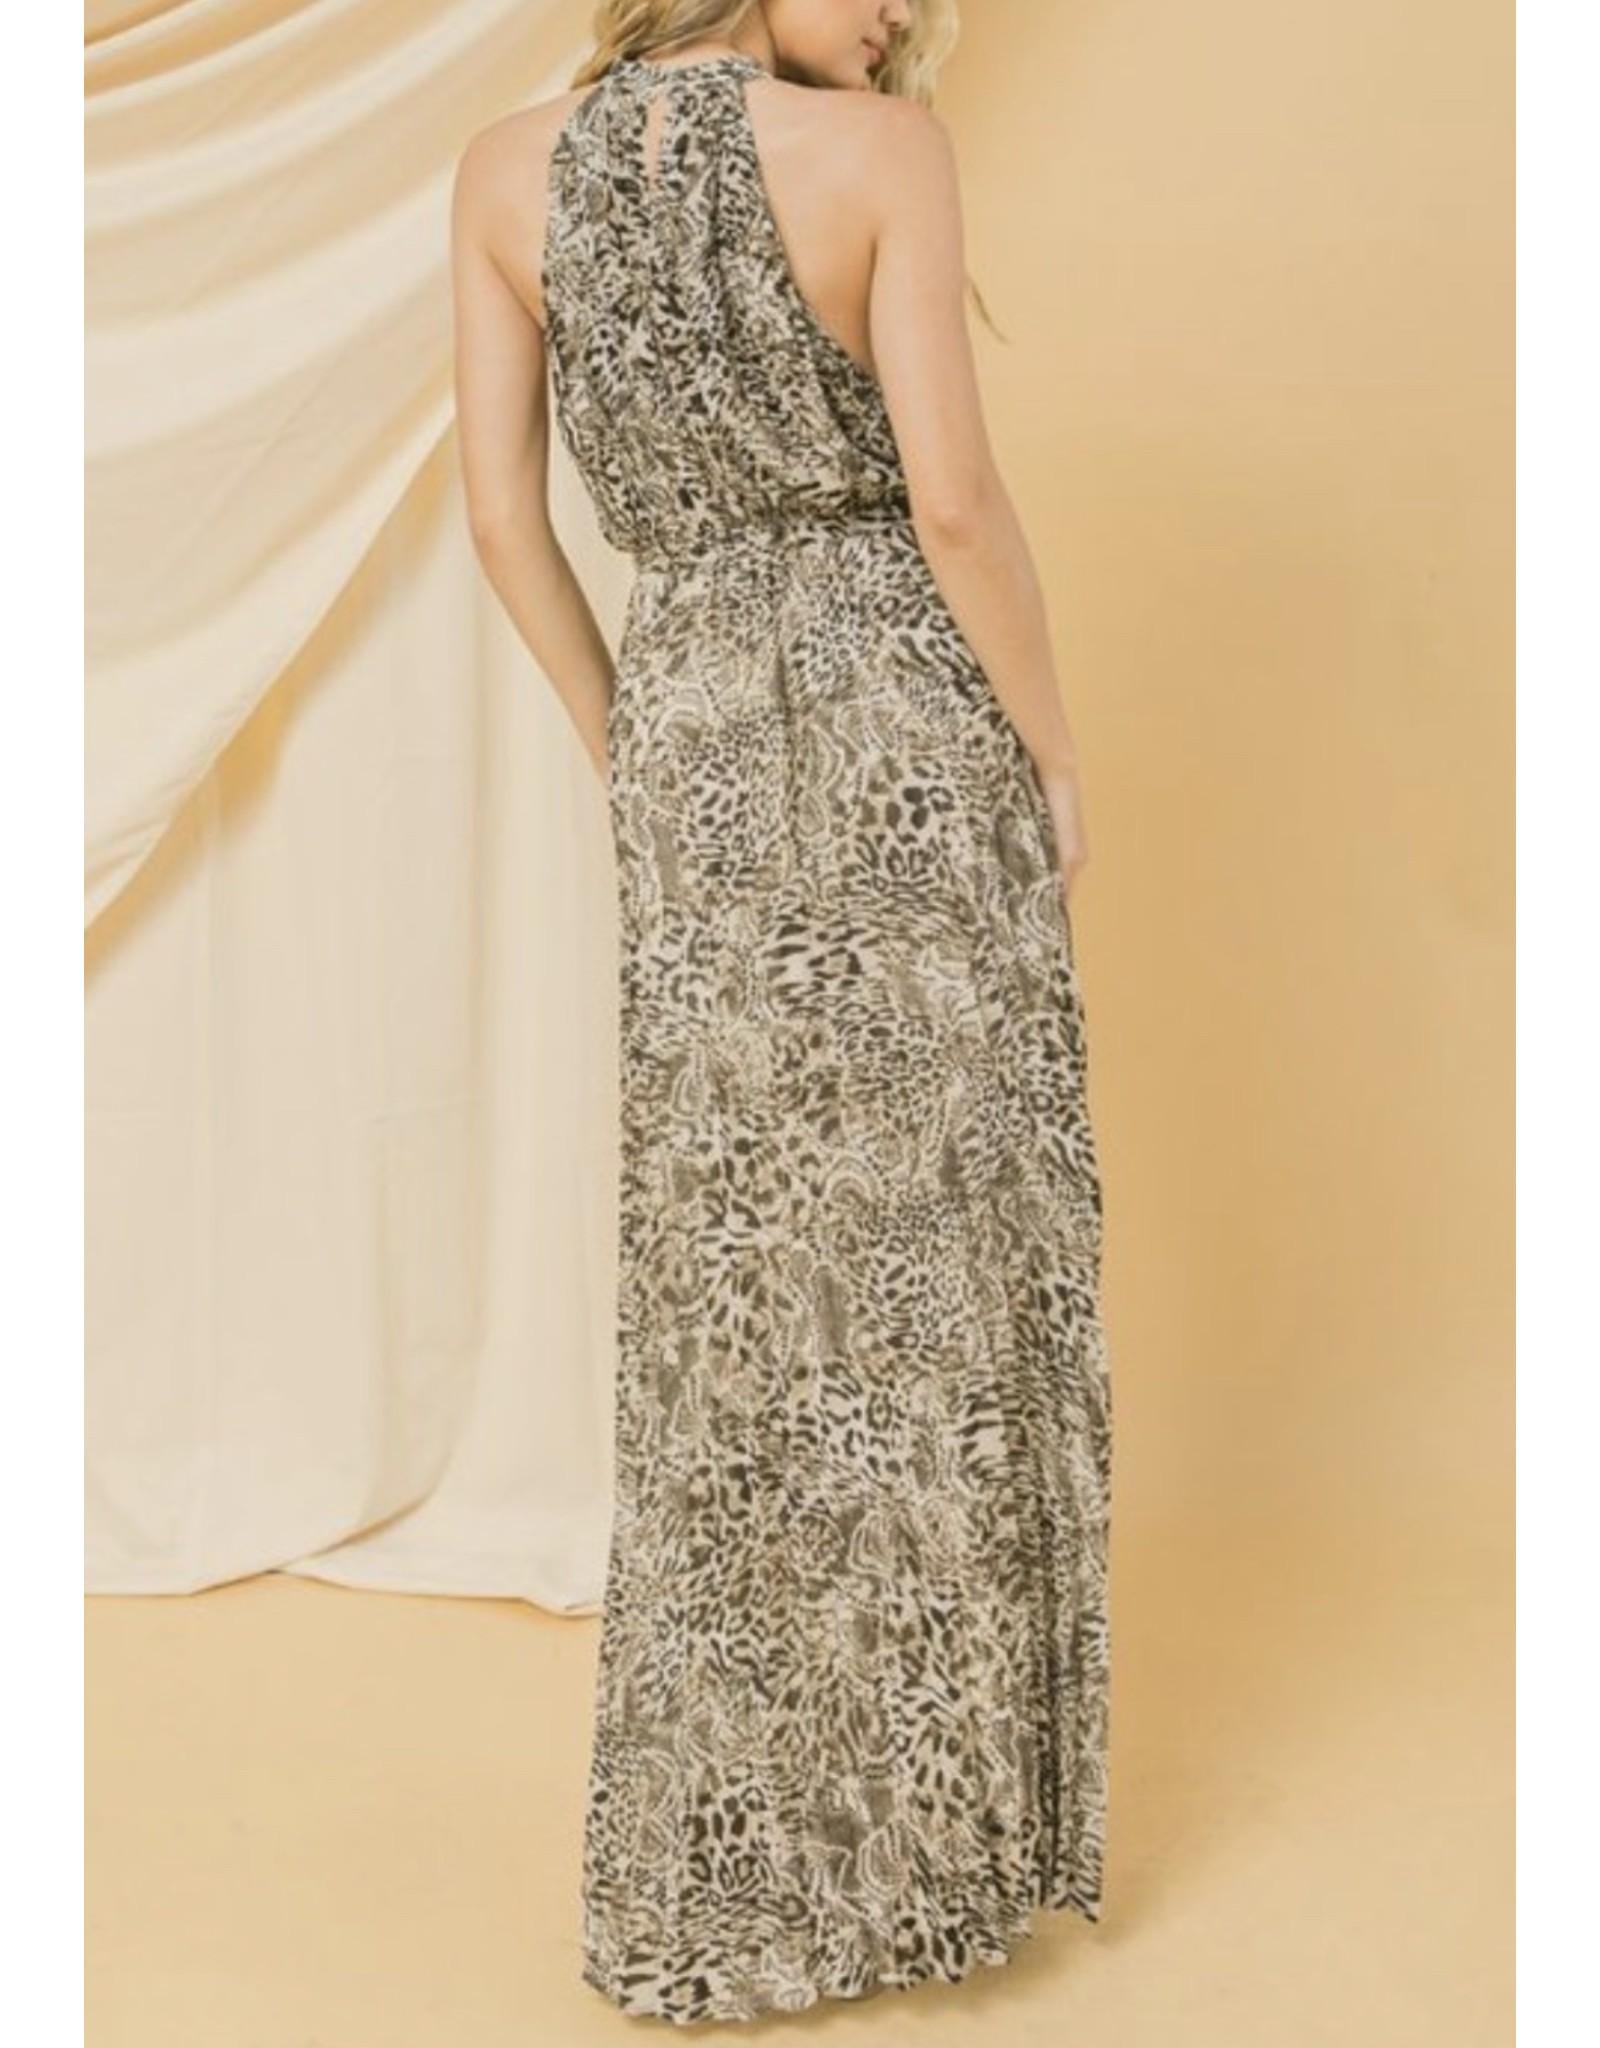 Snake Skin Pleated Maxi Dress - Taupe